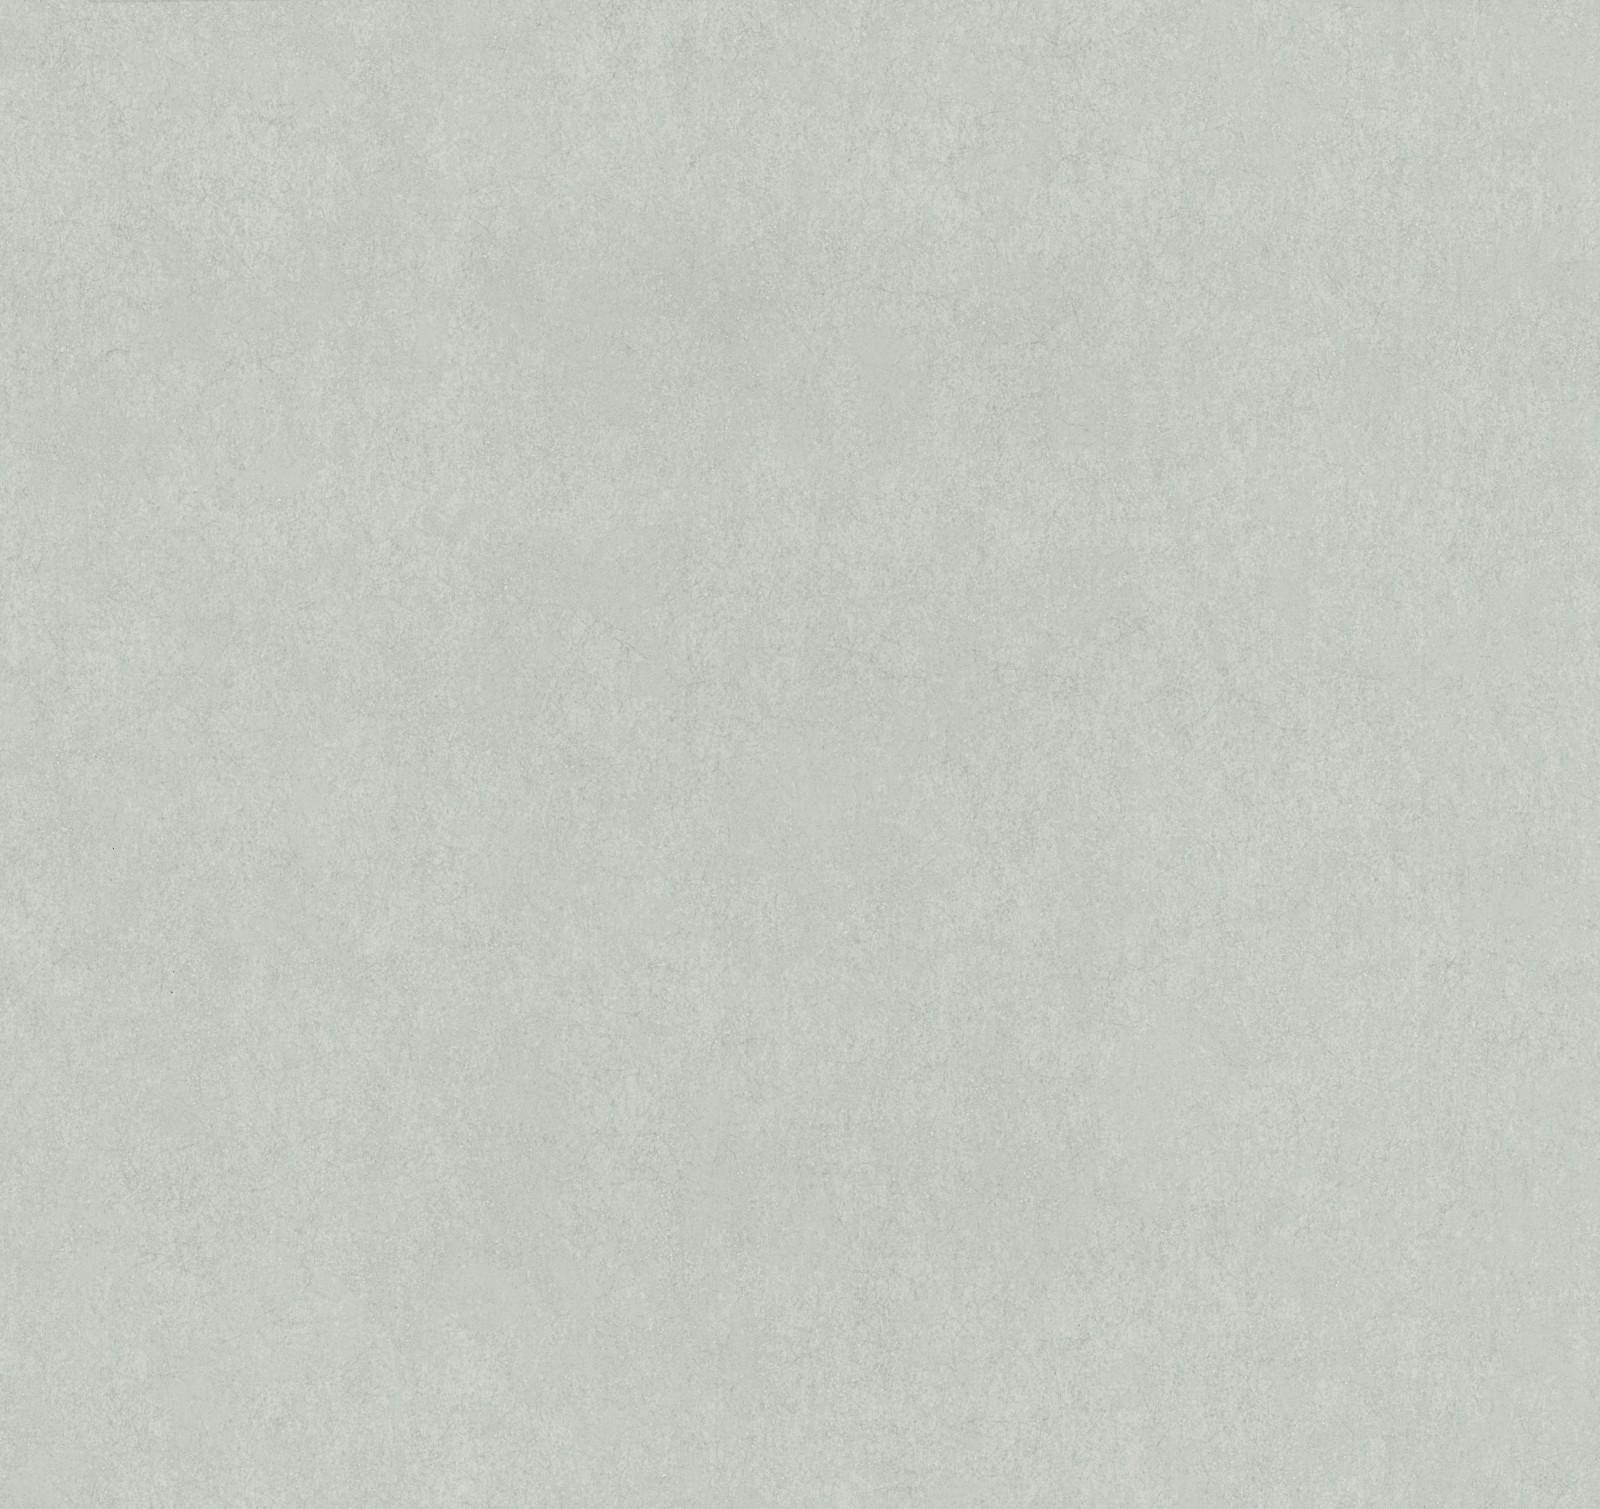 Tapete uni grau glitzer carat ps 13347 20 for Tapete glitzer grau